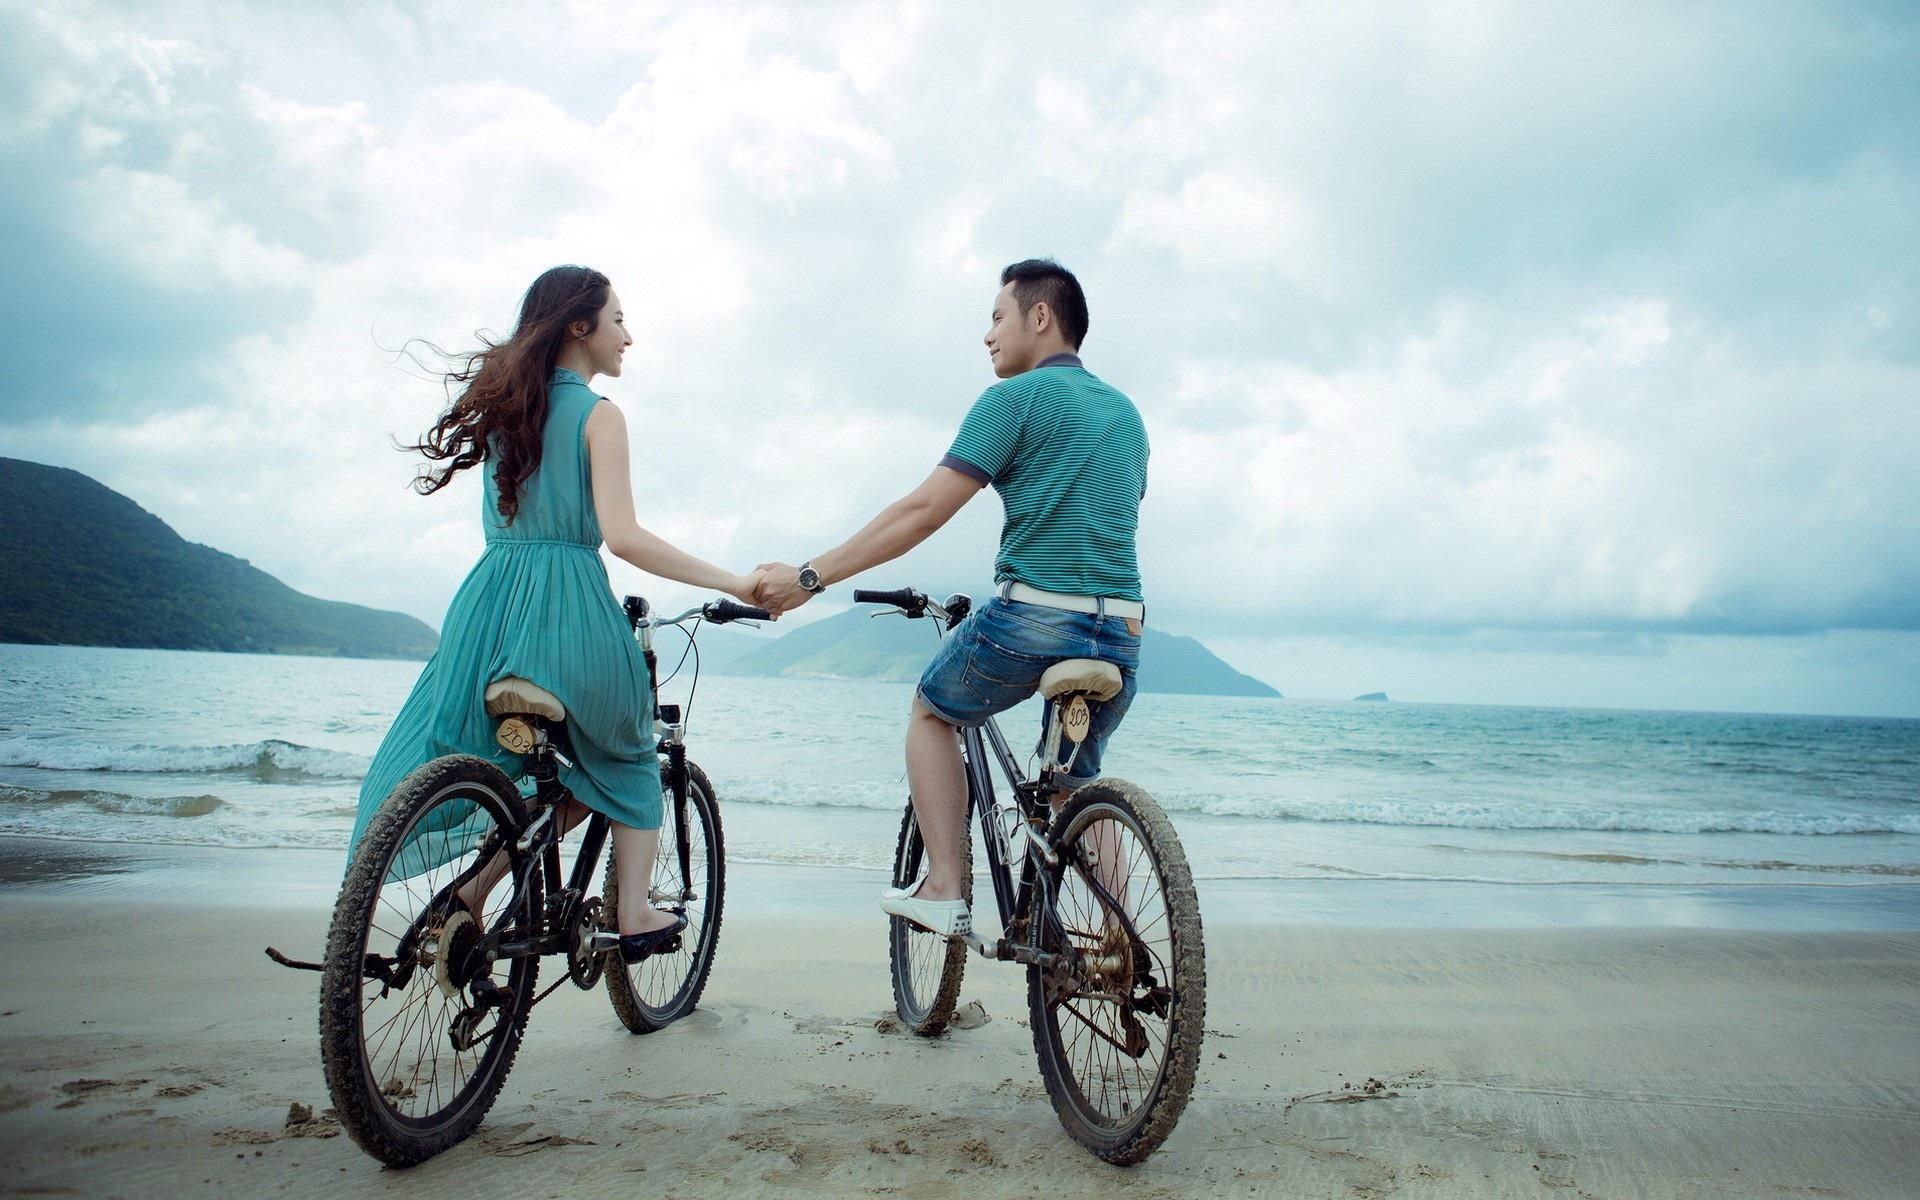 гимнастка фотосессия на велосипеде пара закрепляют